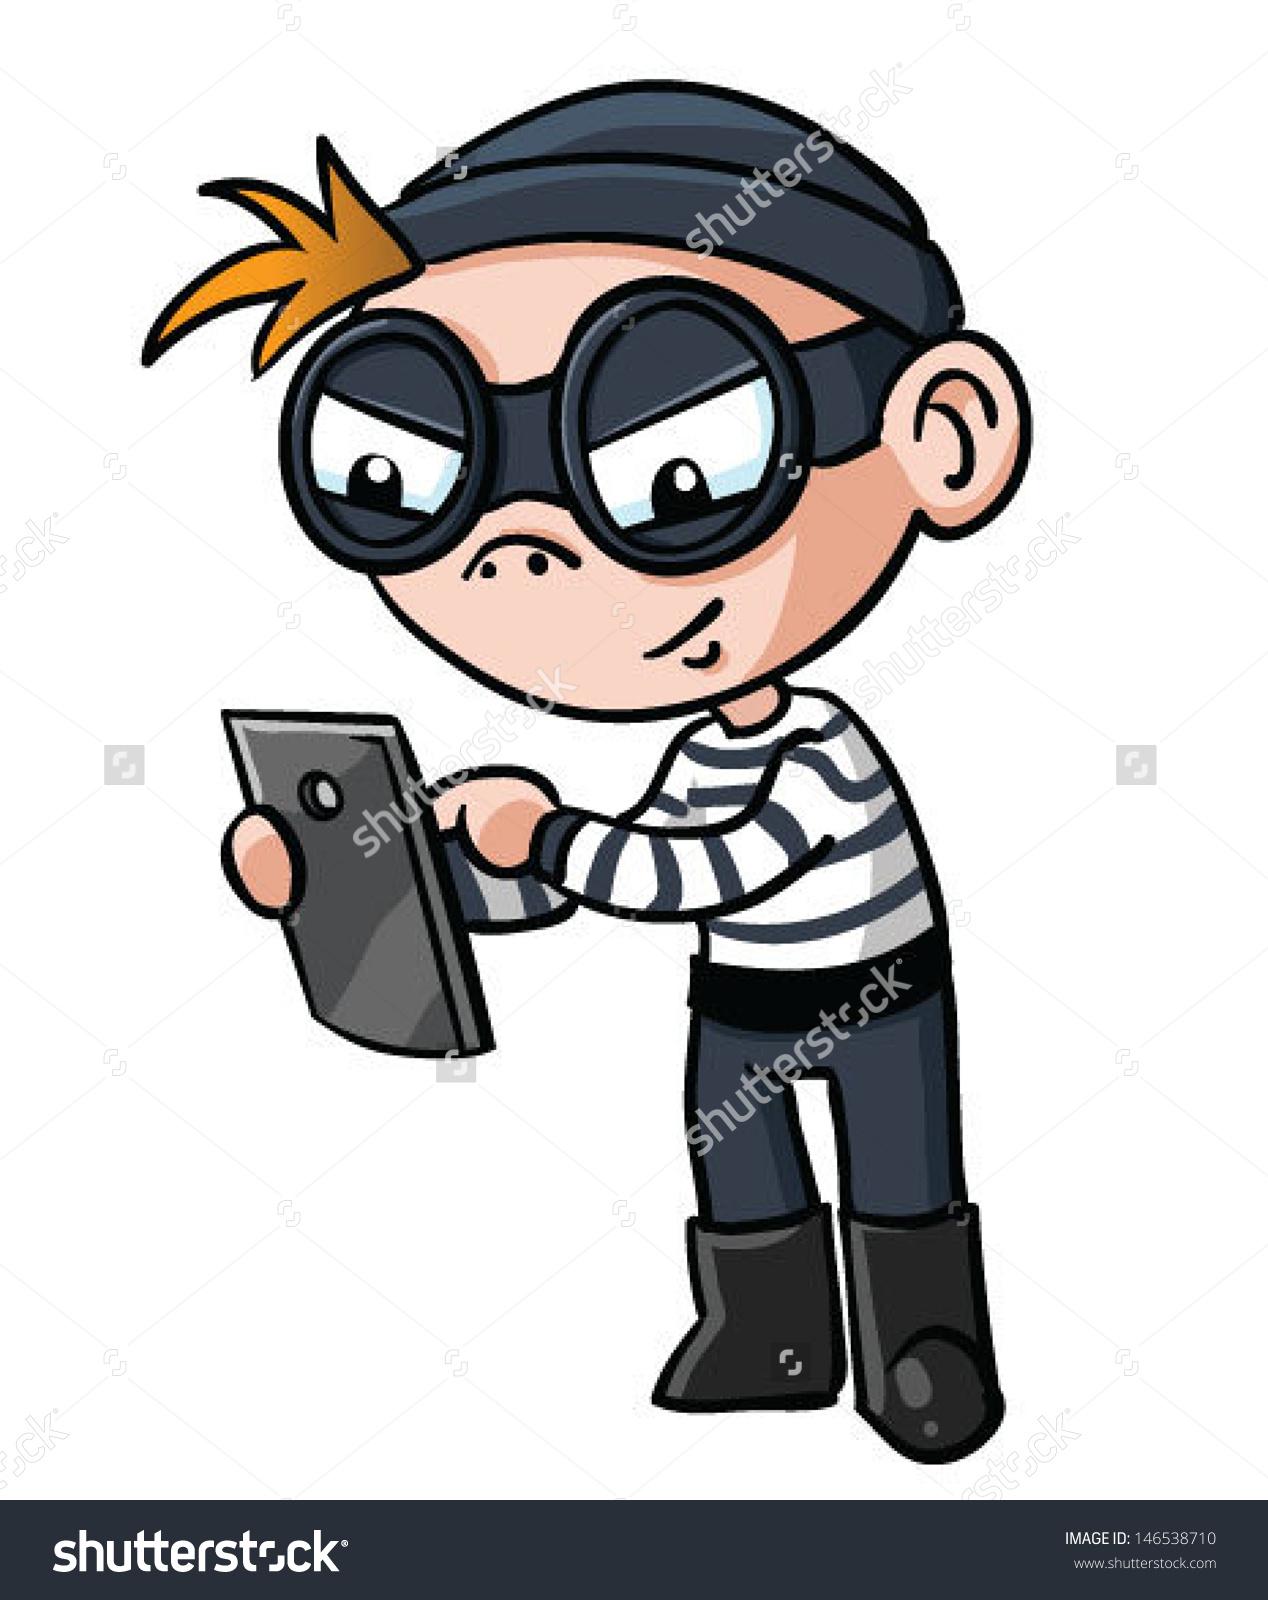 Cop free on dumielauxepices. Burglar clipart criminal